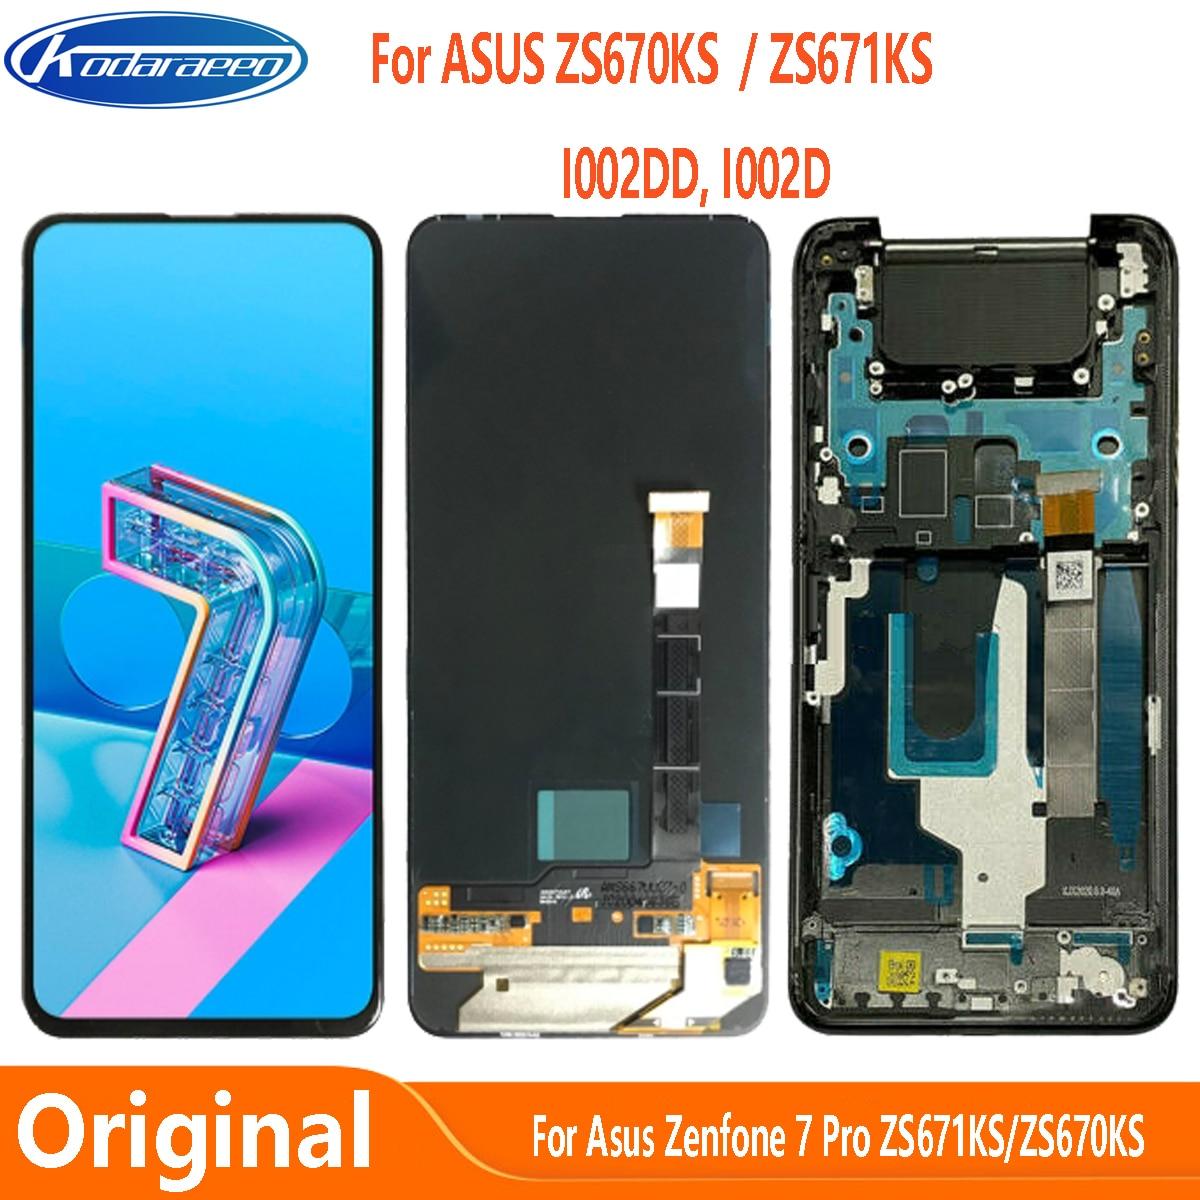 Super AMOLED For Asus Zenfone 7 Pro ZS671KS I002DD LCD Display Touch Screen Digitizer Zenfone 7 ZS670KS I002D LCD Display